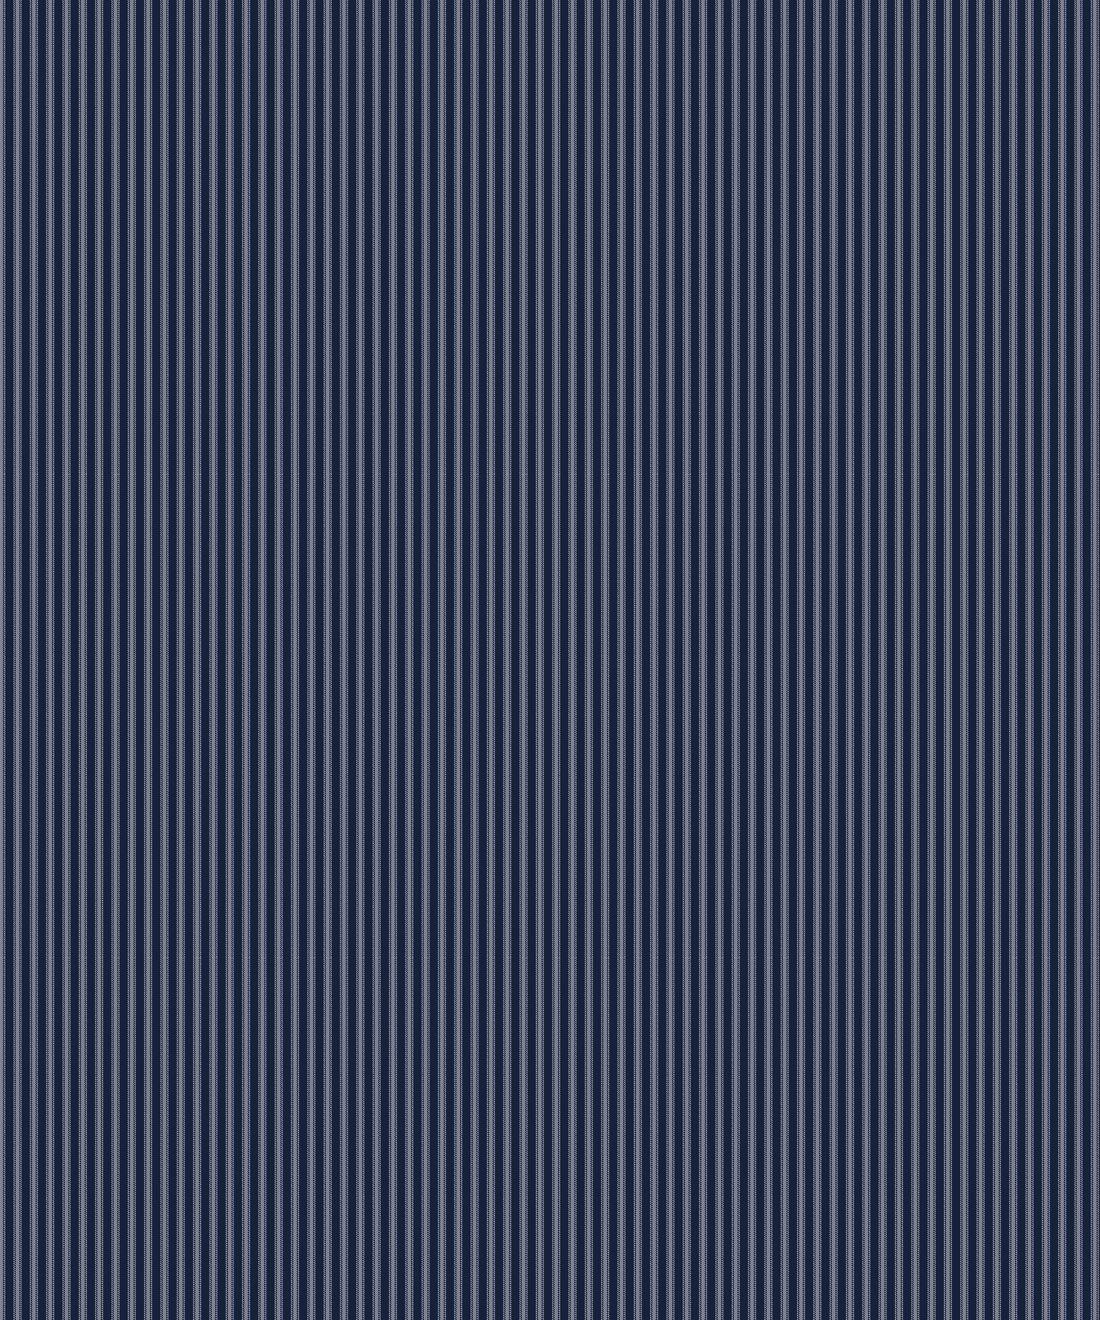 Ticking Stripe Wallpaper • Maastrict Blue Wallpaper • Swatch